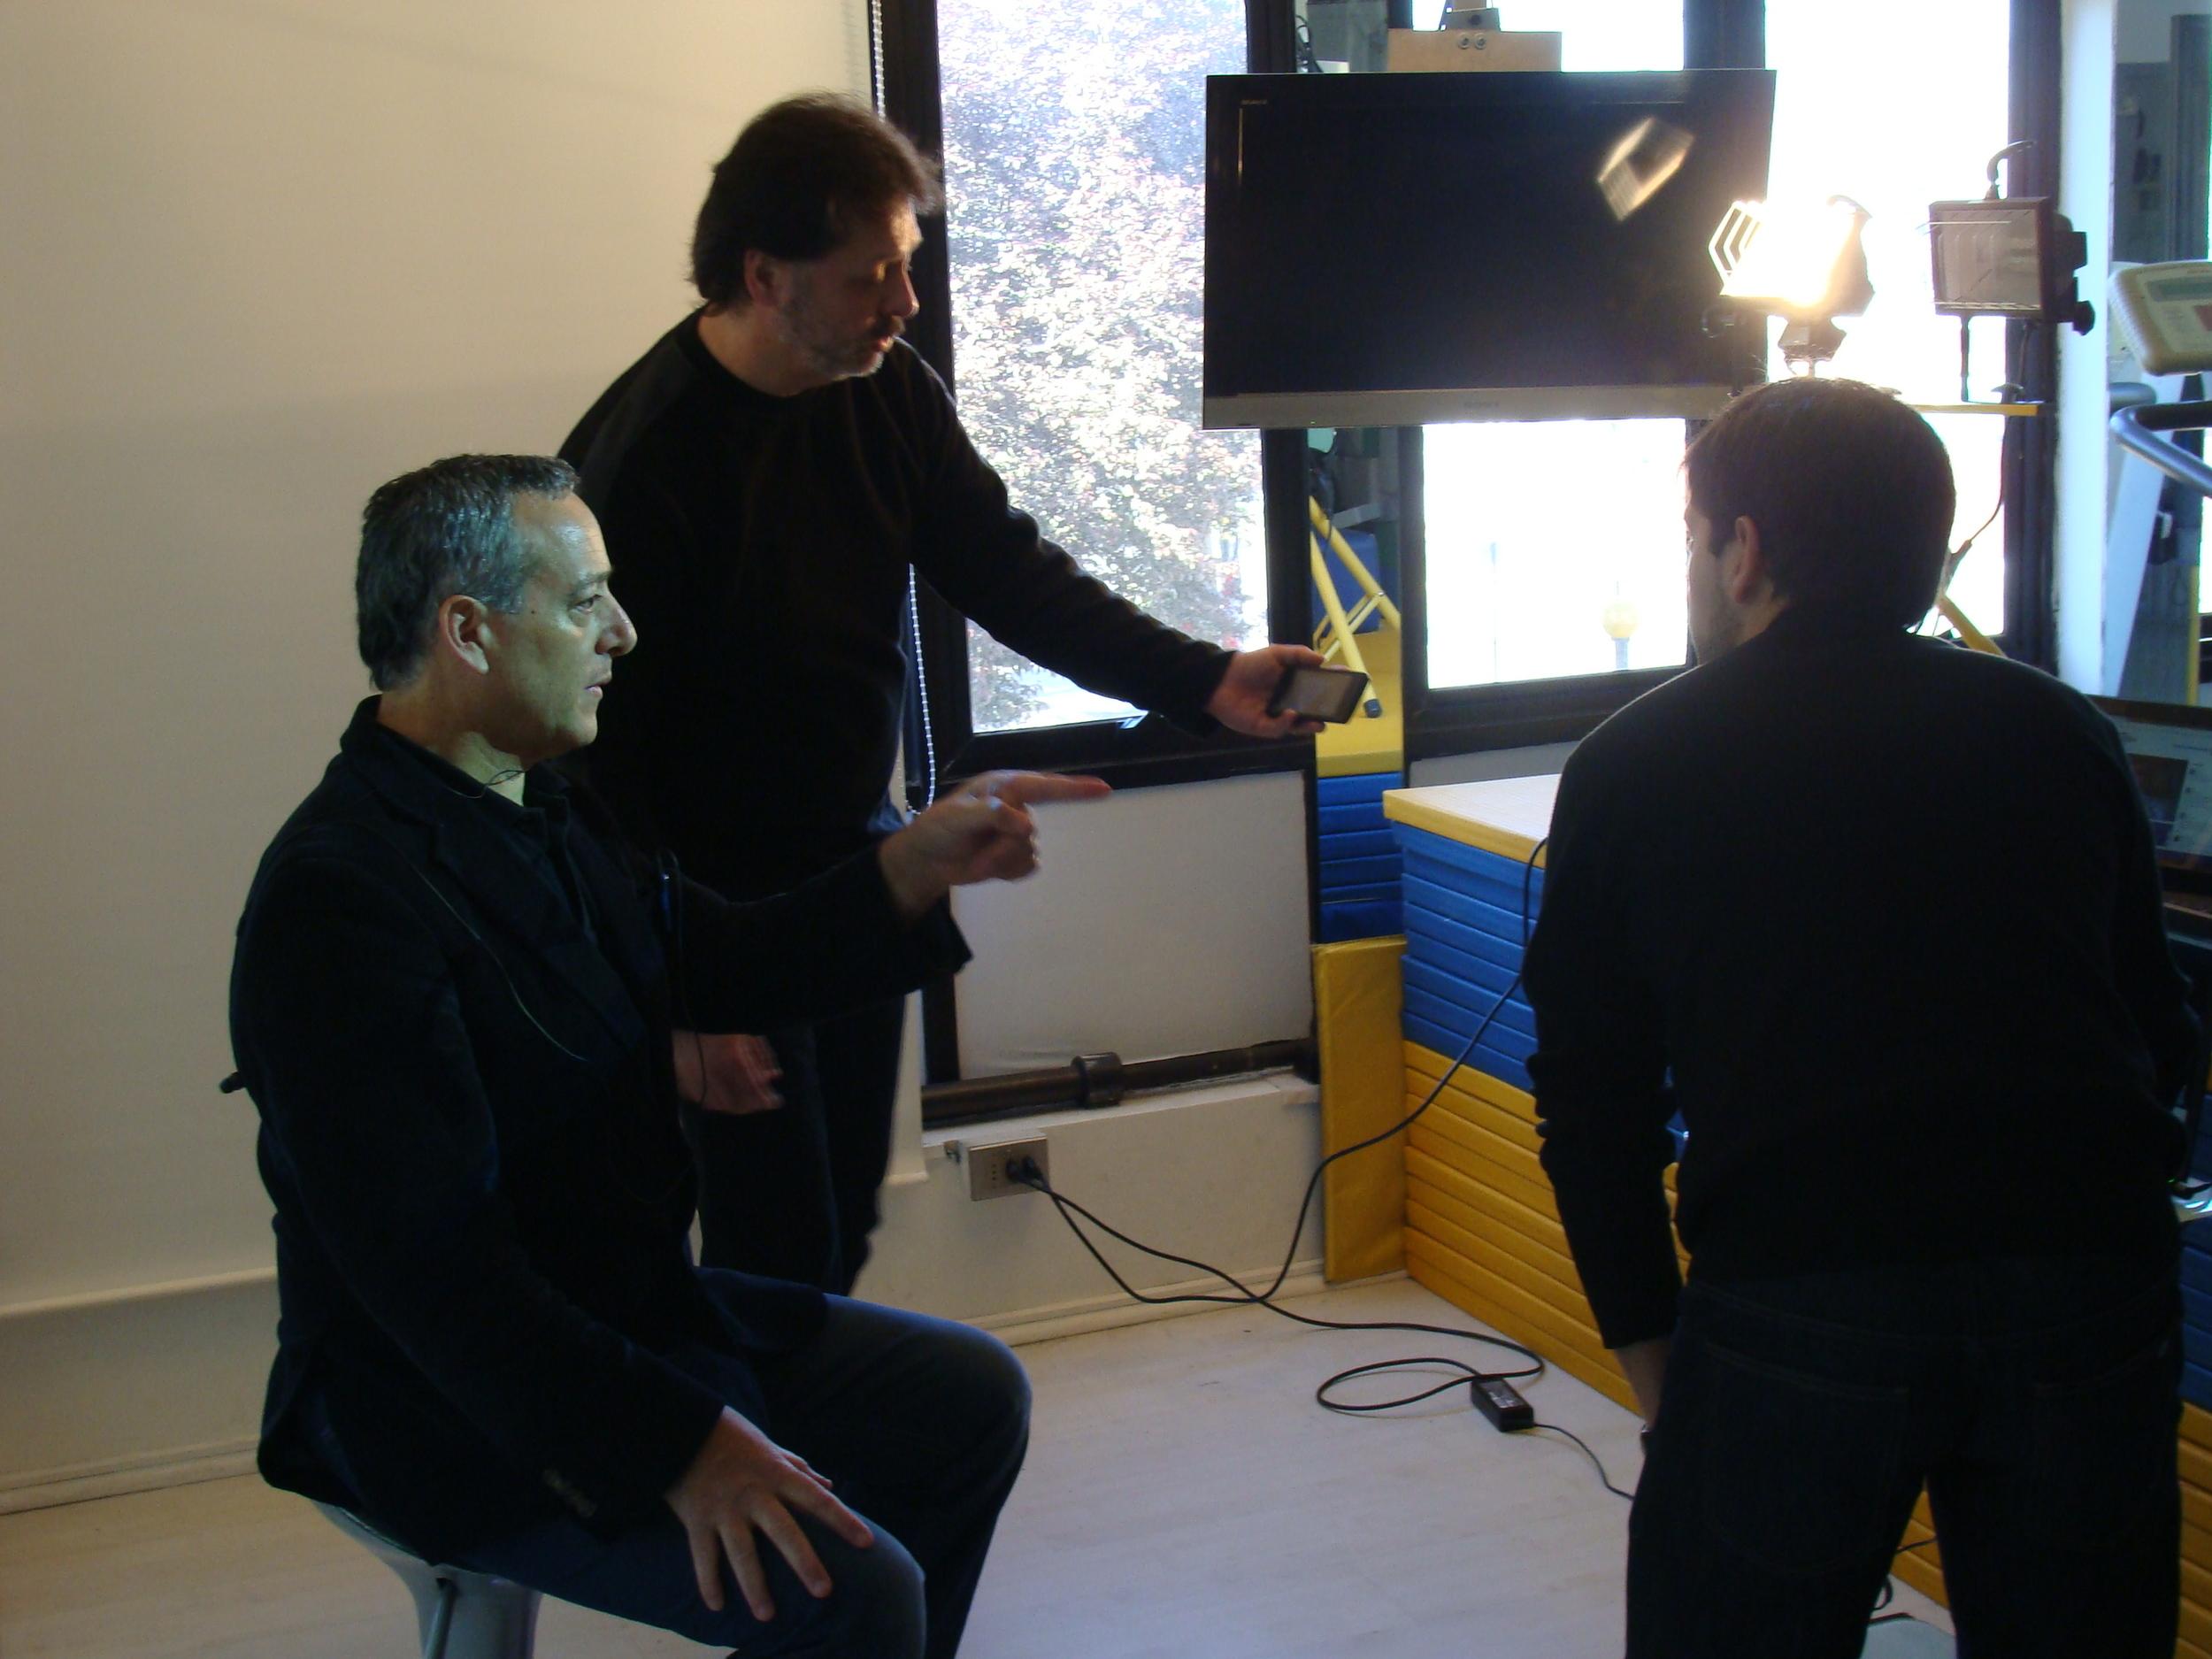 kinesiologos- charla internacional - kinesic work - sergio zuñiga marcelo guerrero carlos espinoza.JPG